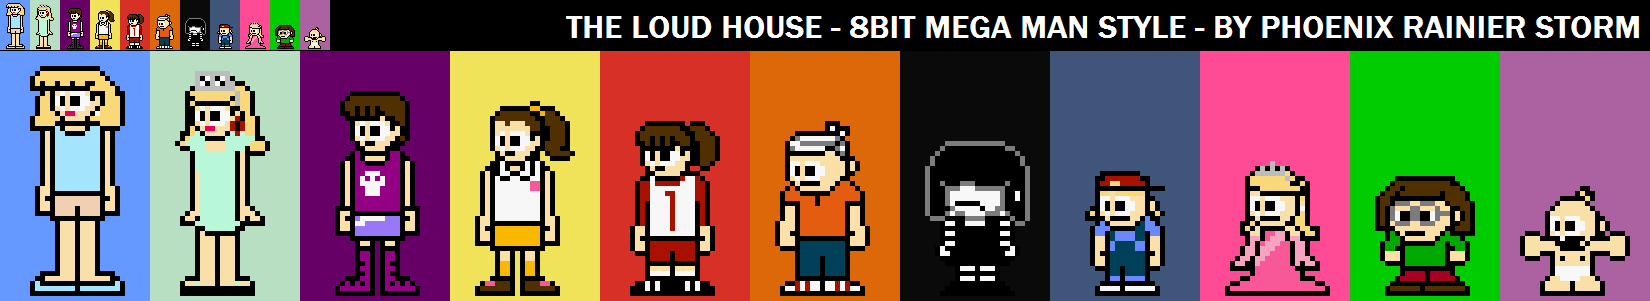 The Loud House 8bit Mega Man Style By Prstorm On Deviantart